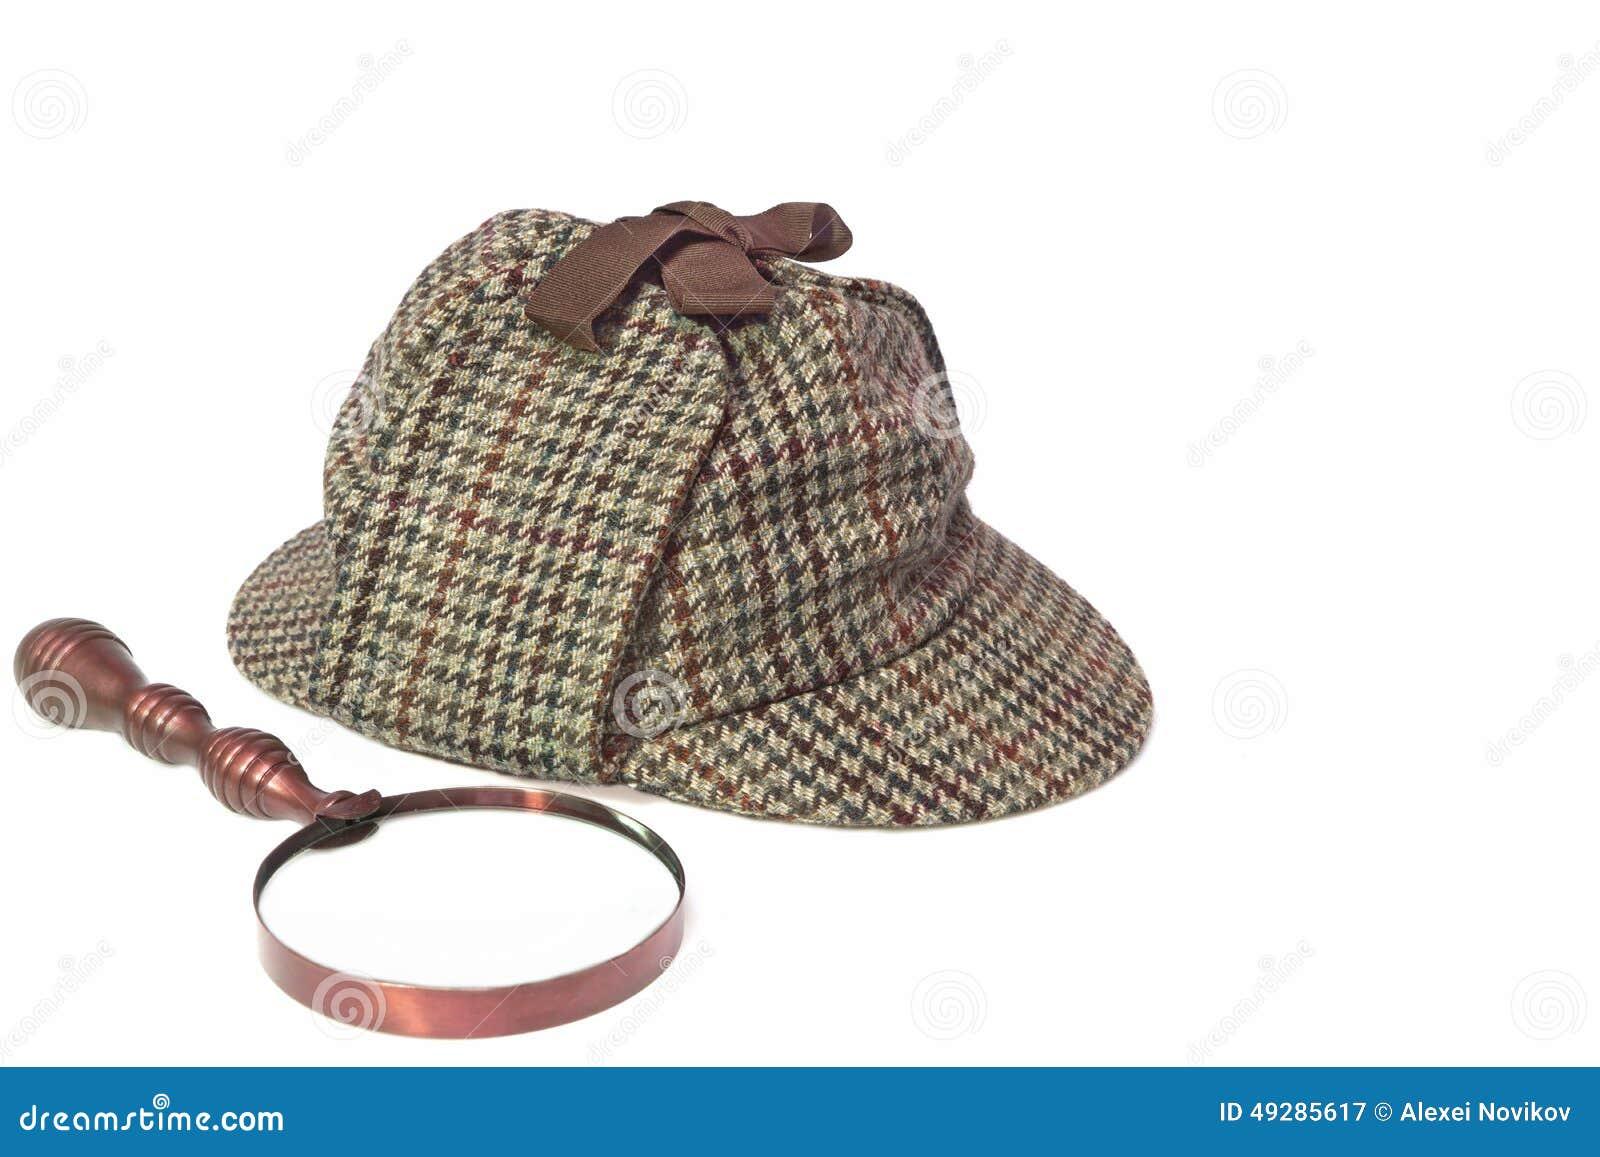 Deerstalker Hat And Retro Magnifying Glass Stock Image ...